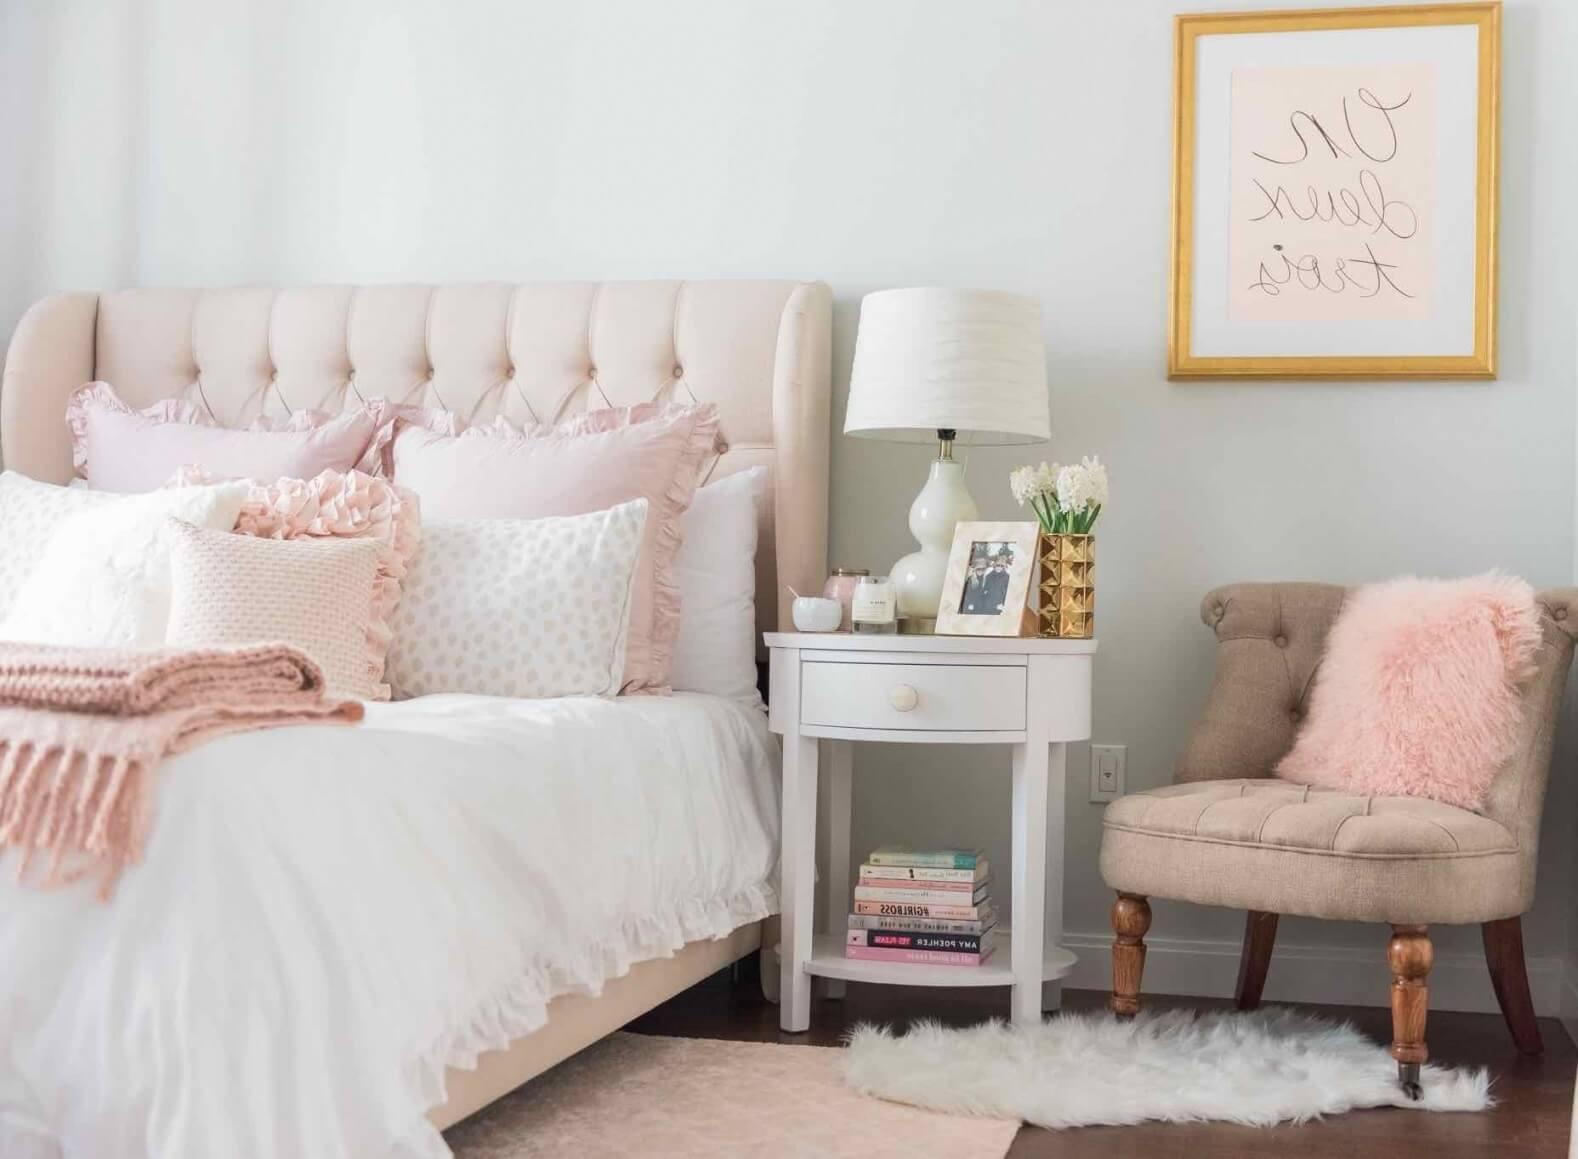 мебельные тренды 2019 года